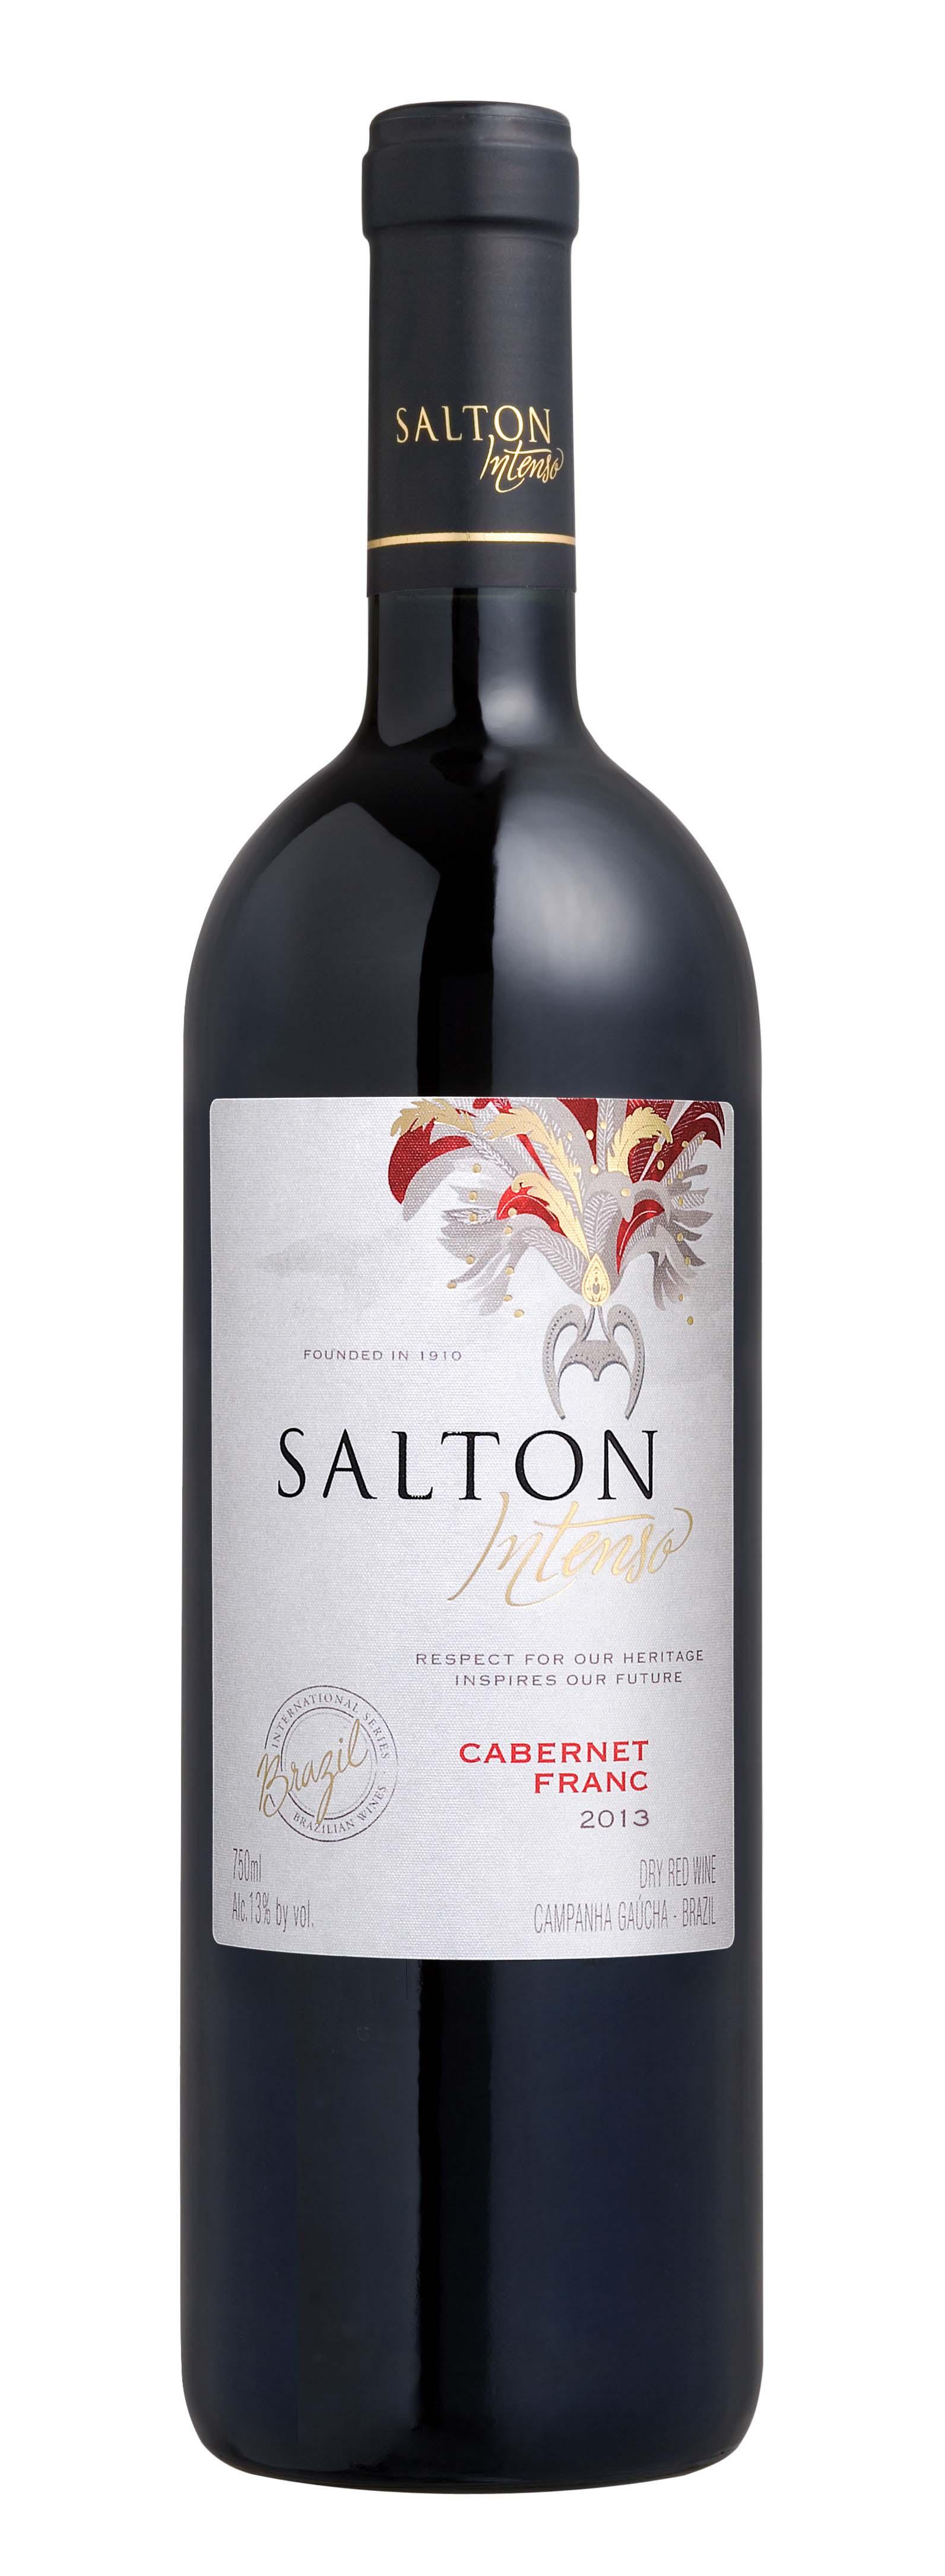 2012 Salton Intenso Cabernet Franc